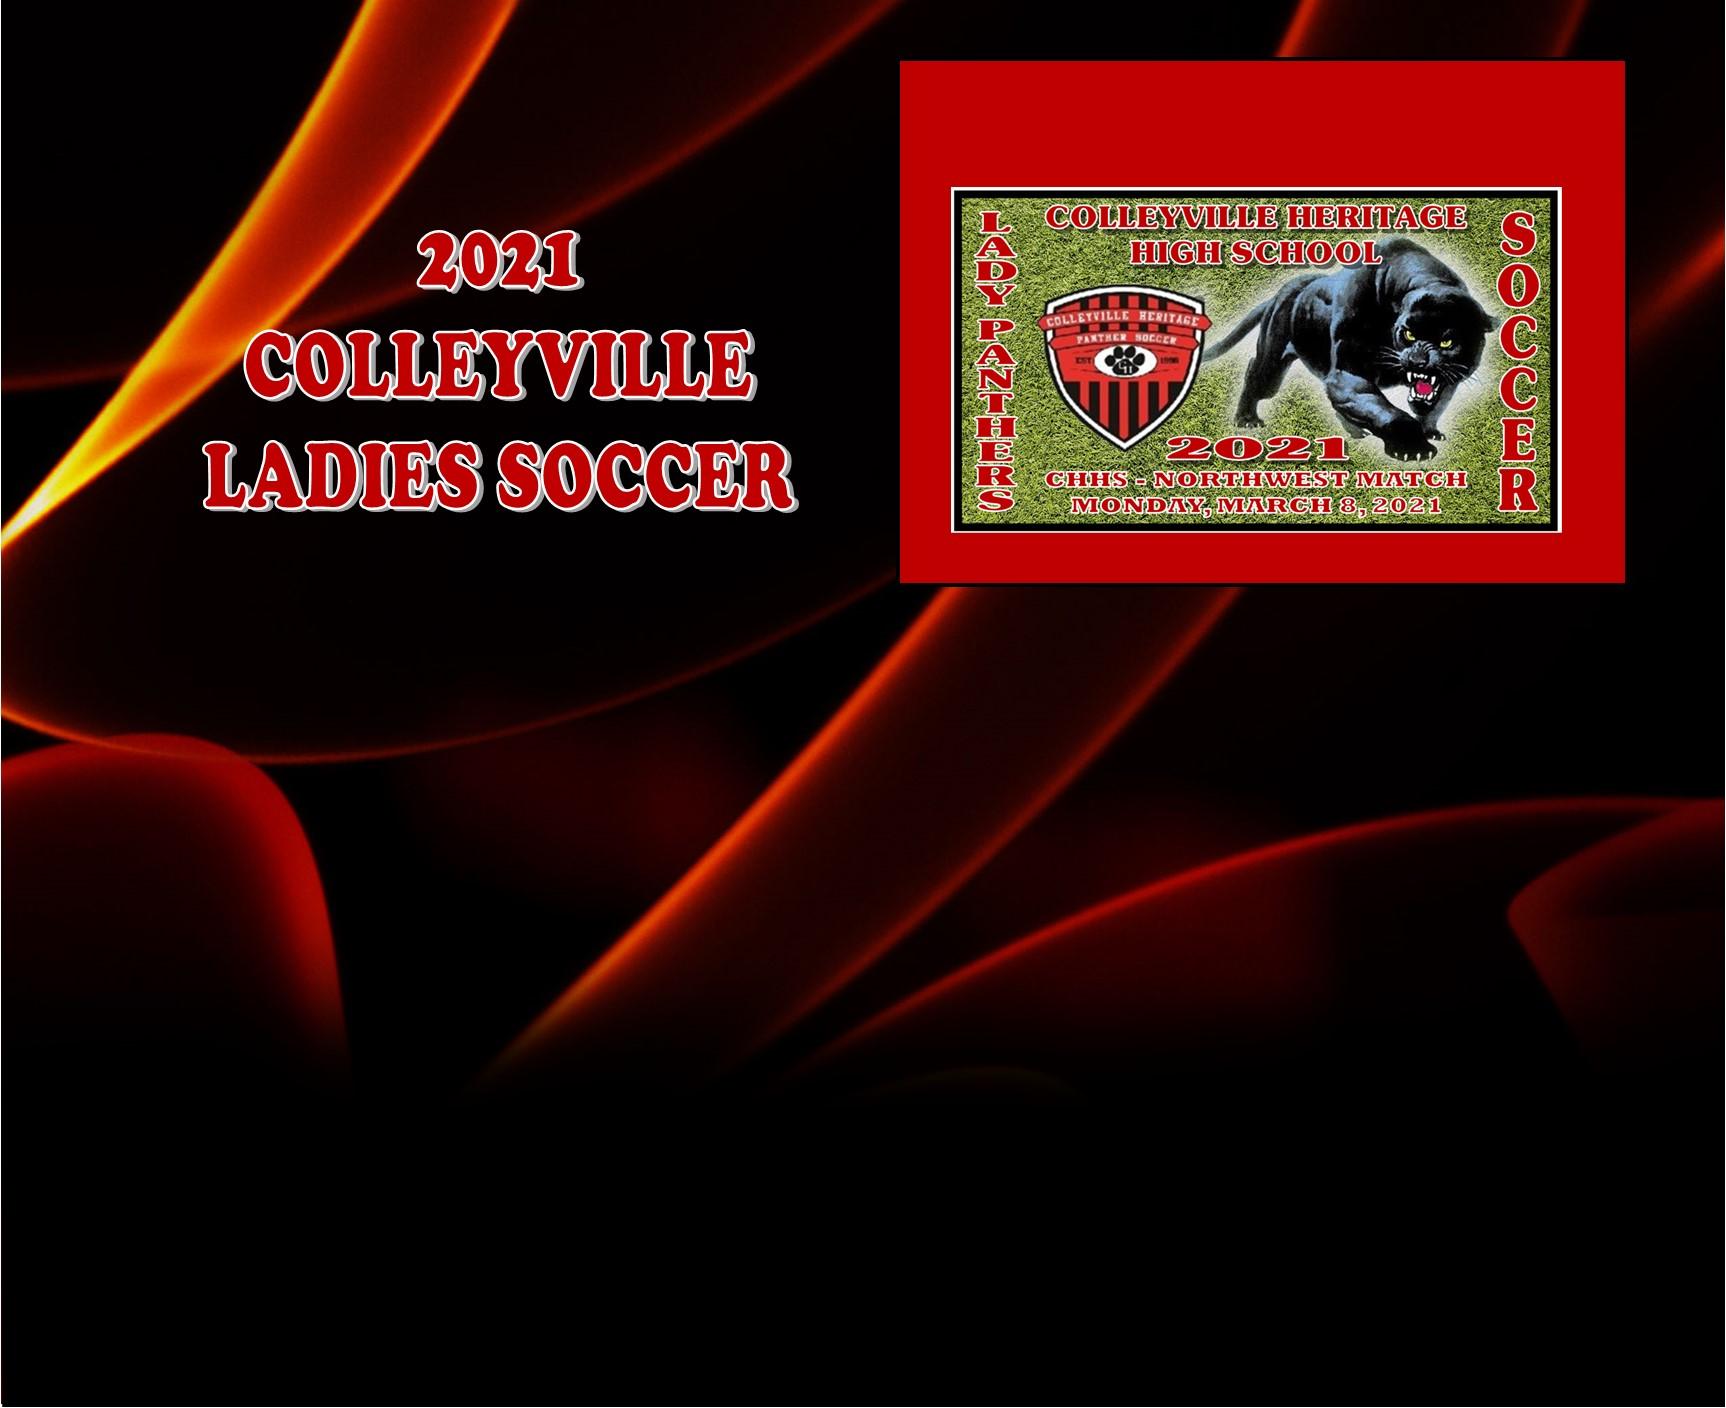 GCISD Ladies Soccer: Colleyville Panthers Cream Northwest Texans 8-0